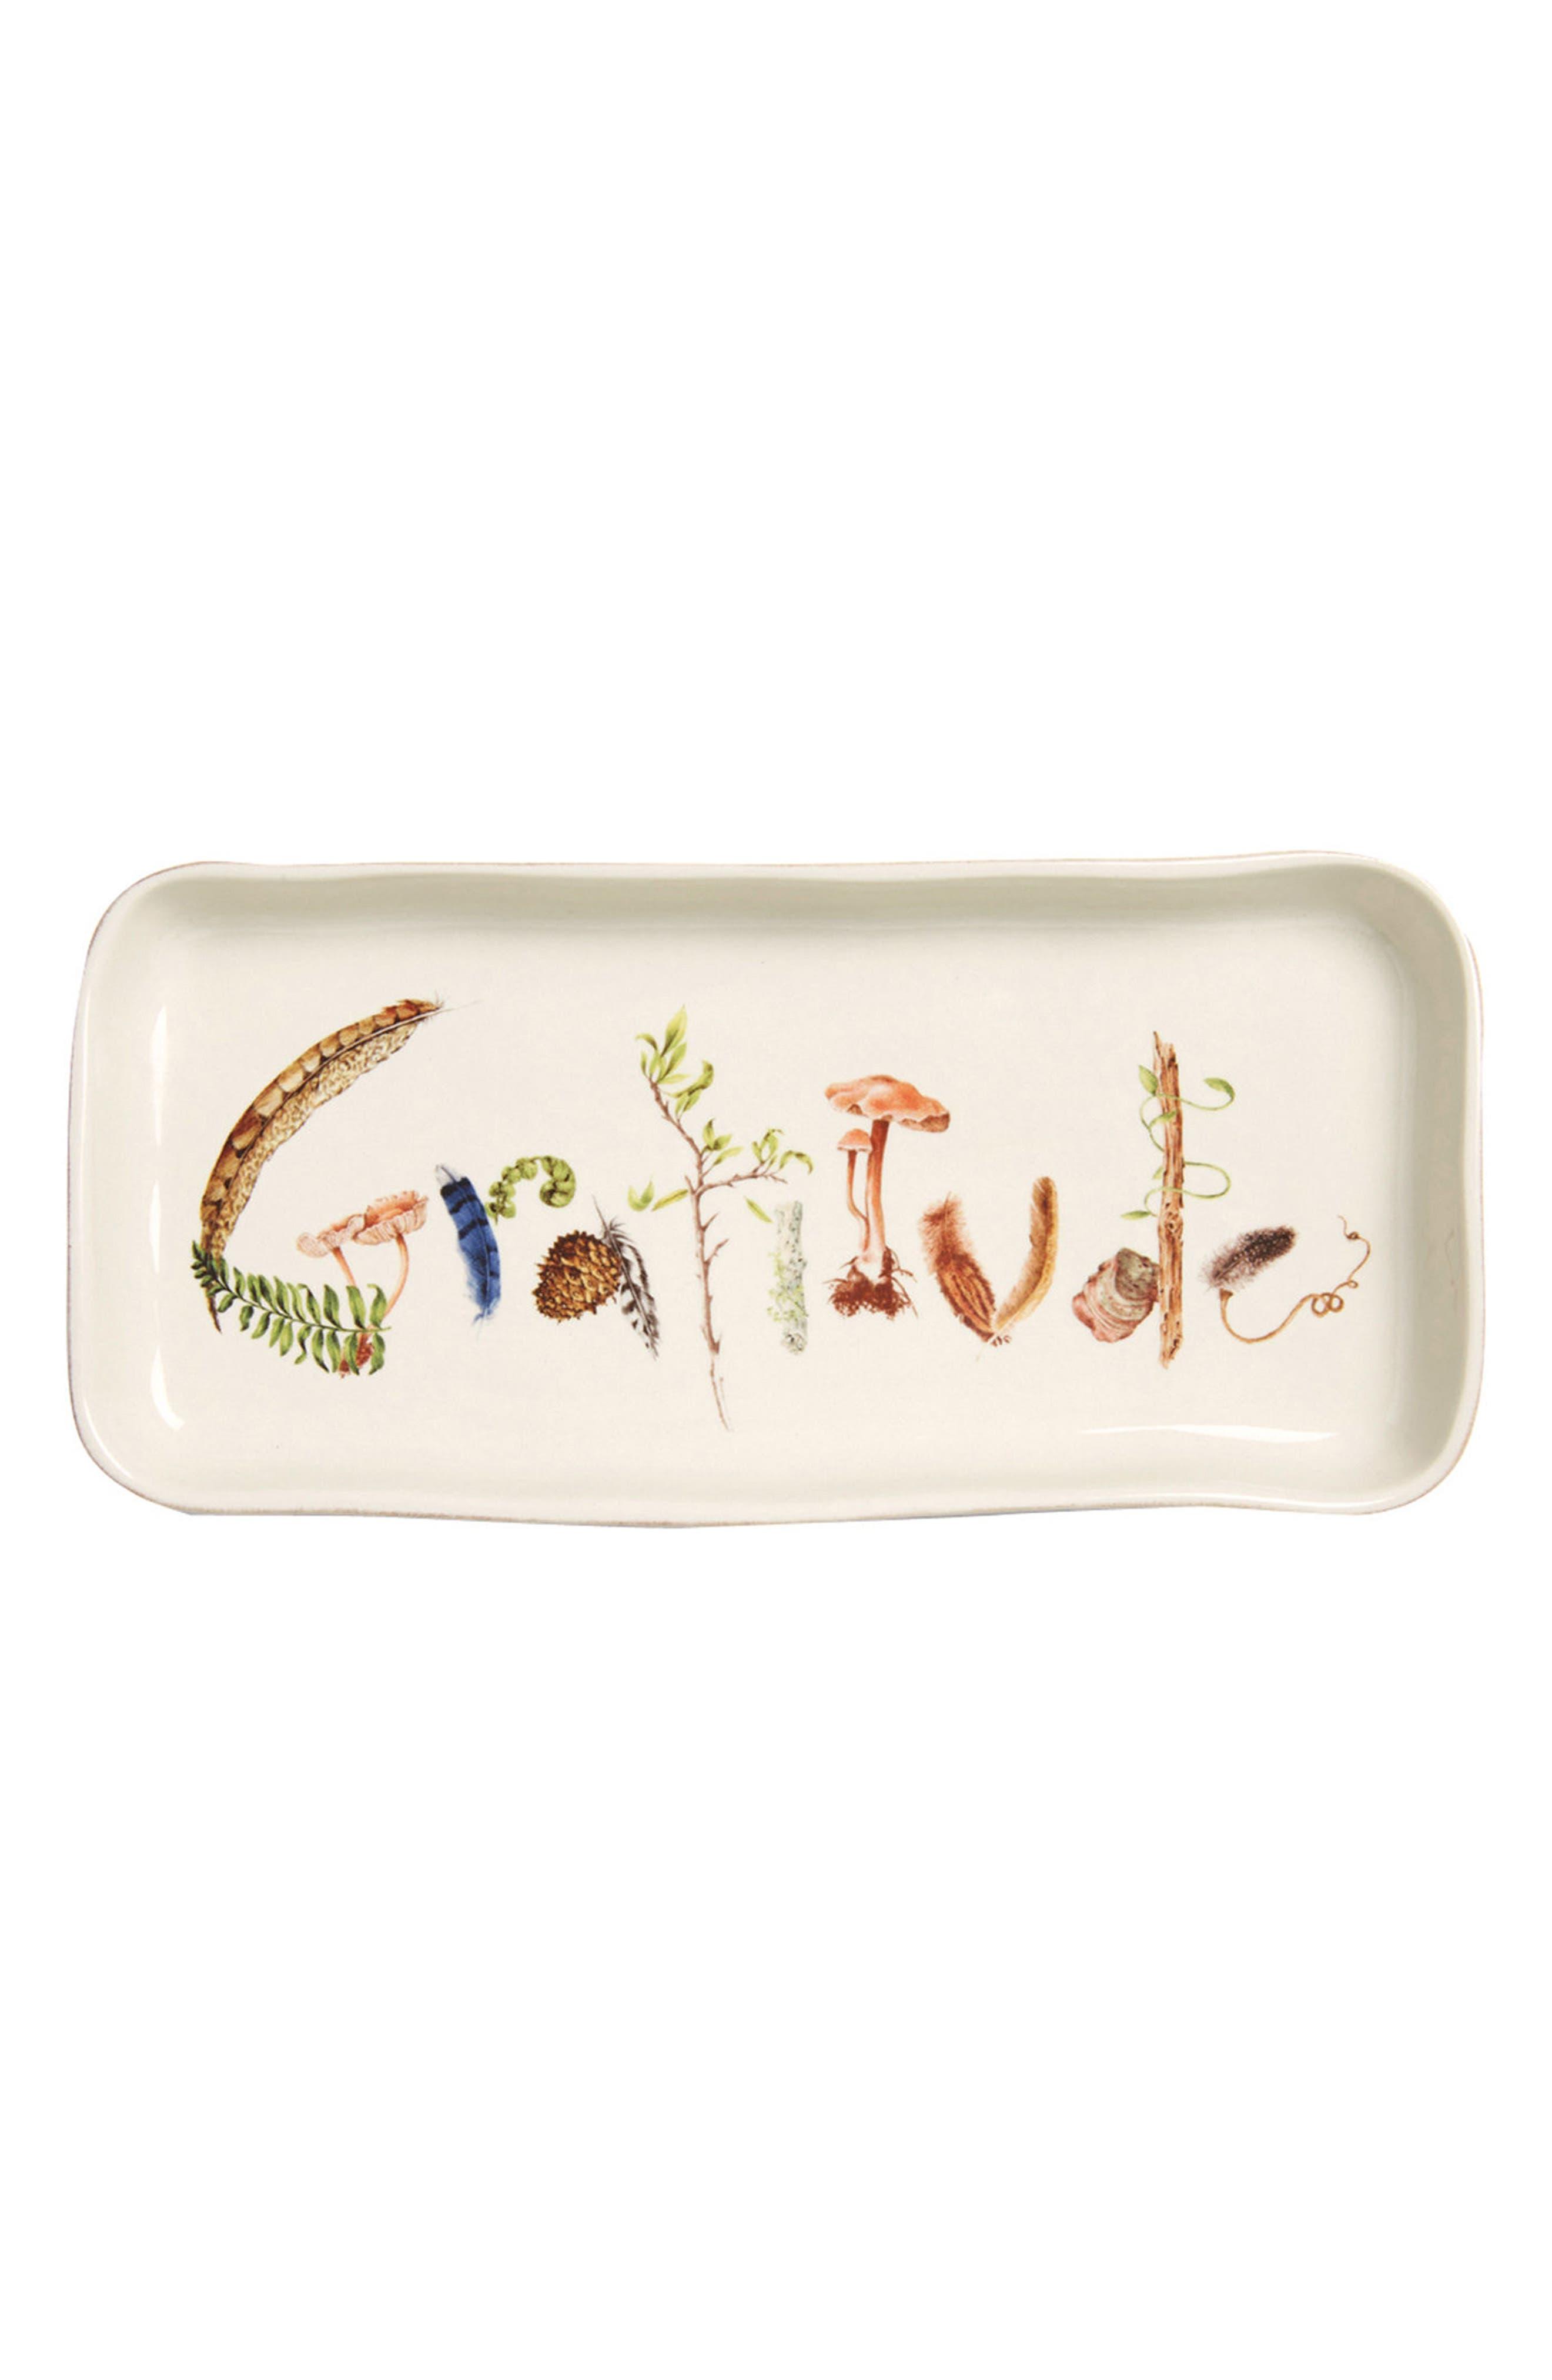 Forest Walk Gratitude Ceramic Tray,                         Main,                         color, CAF AU LAIT